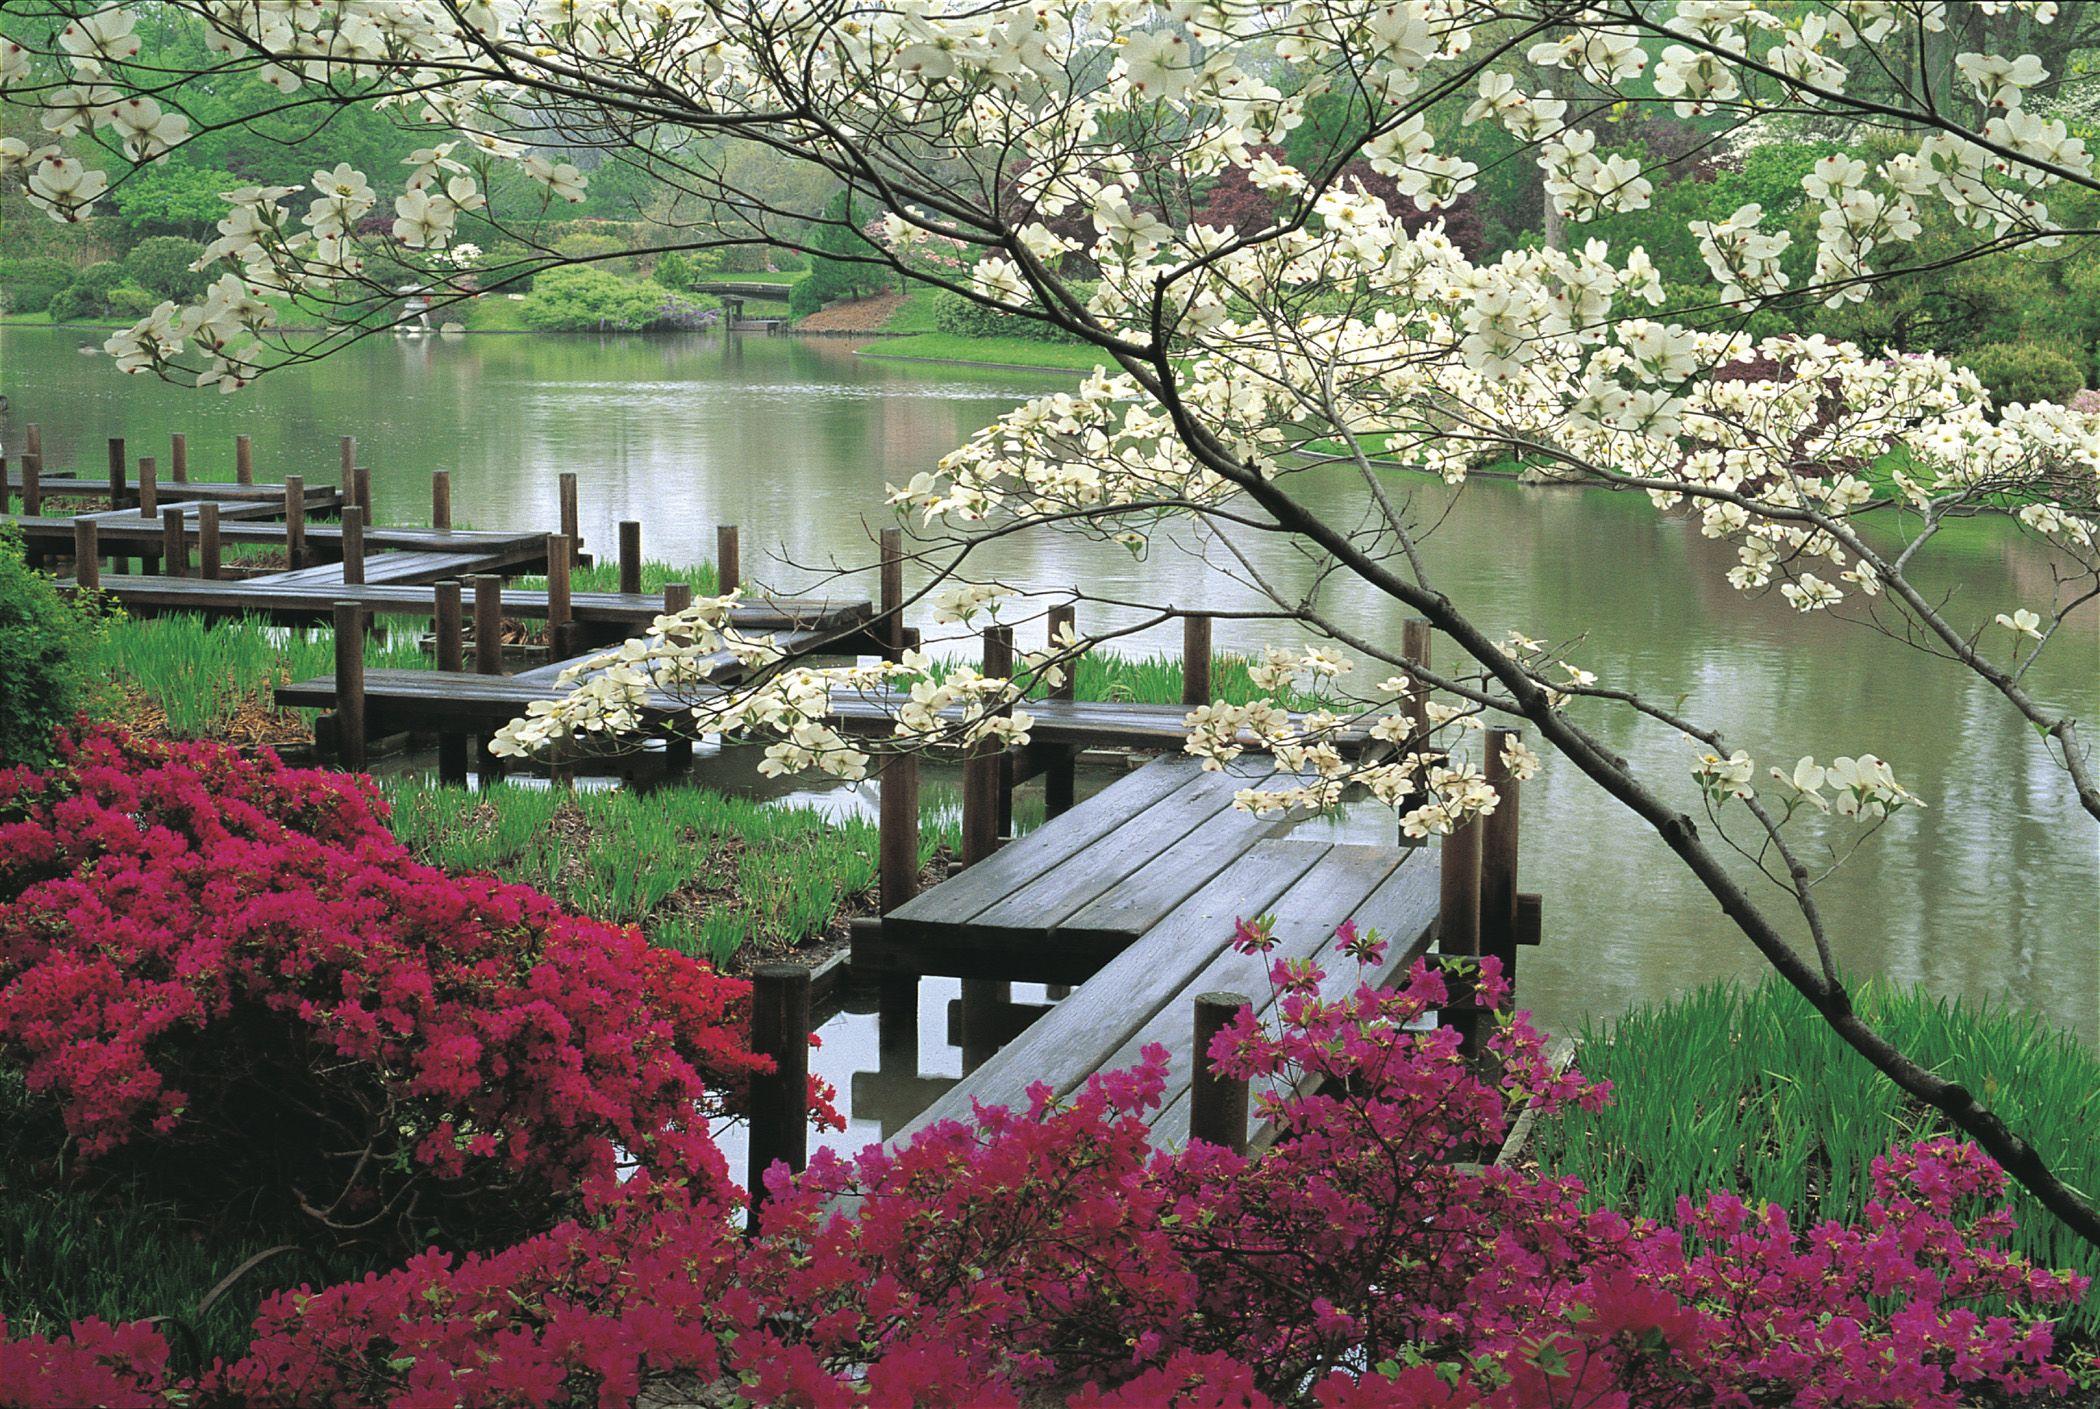 Spring Japanese Garden Wallpaper Good Design 6 On Ideas 2100x1409 Pixel